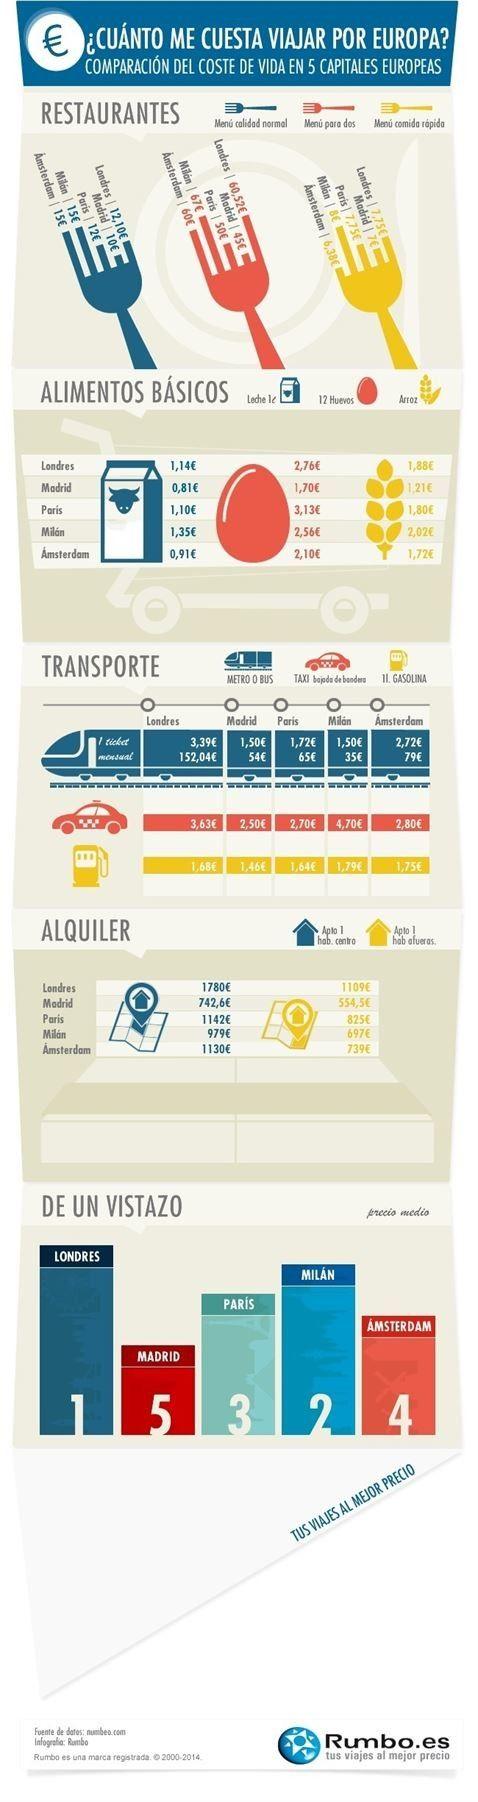 25 best Infografías sobre turismo images on Pinterest | Turismo ...